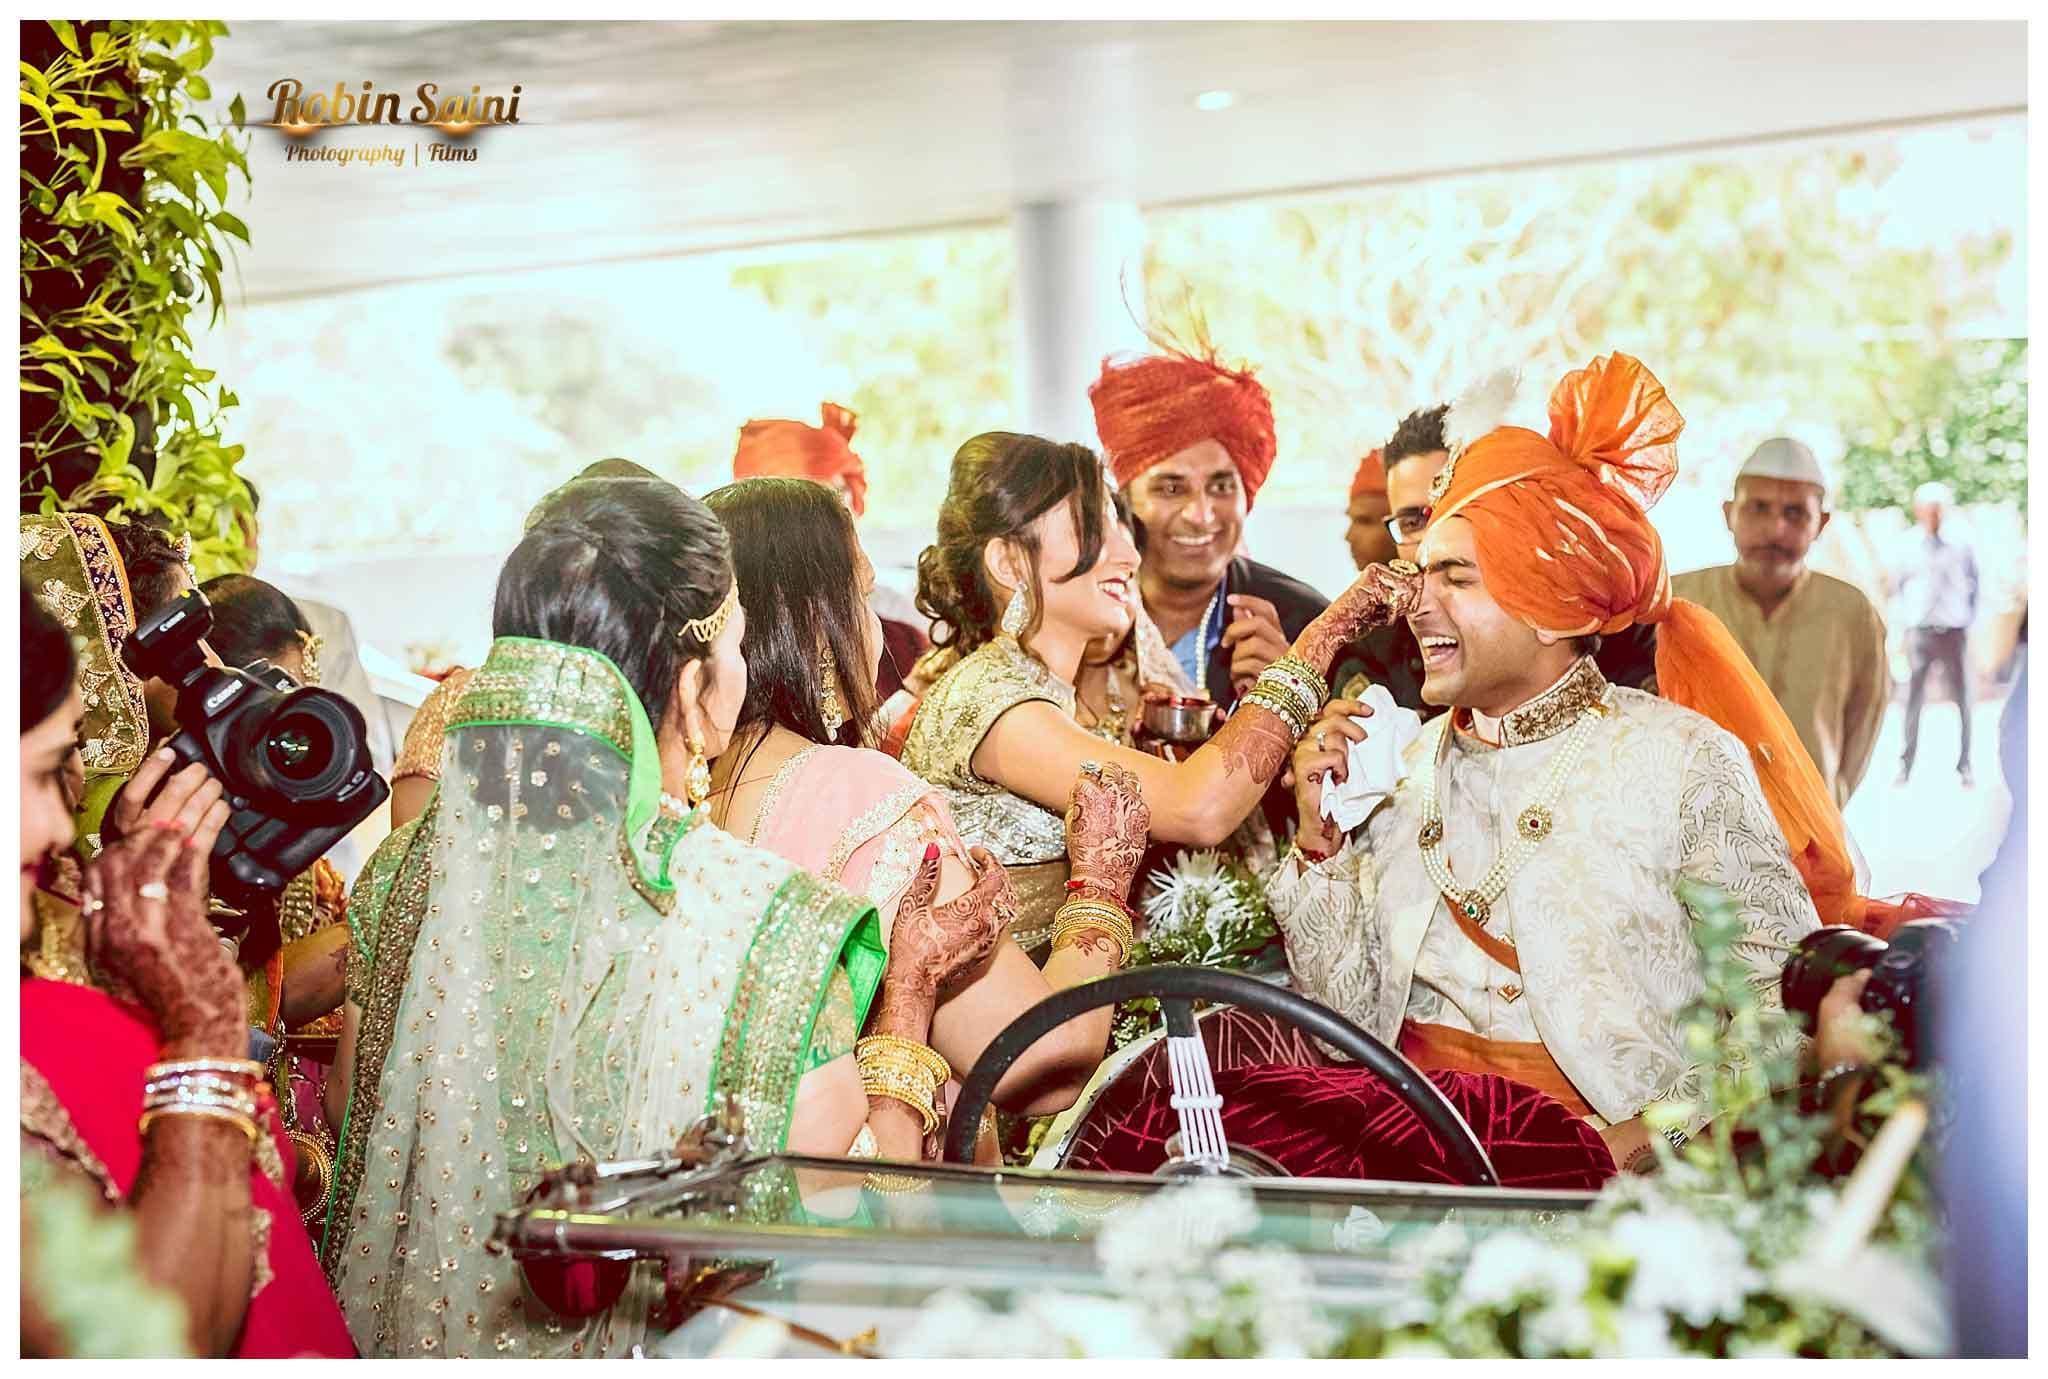 wedding rituals with groom:robin saini photography